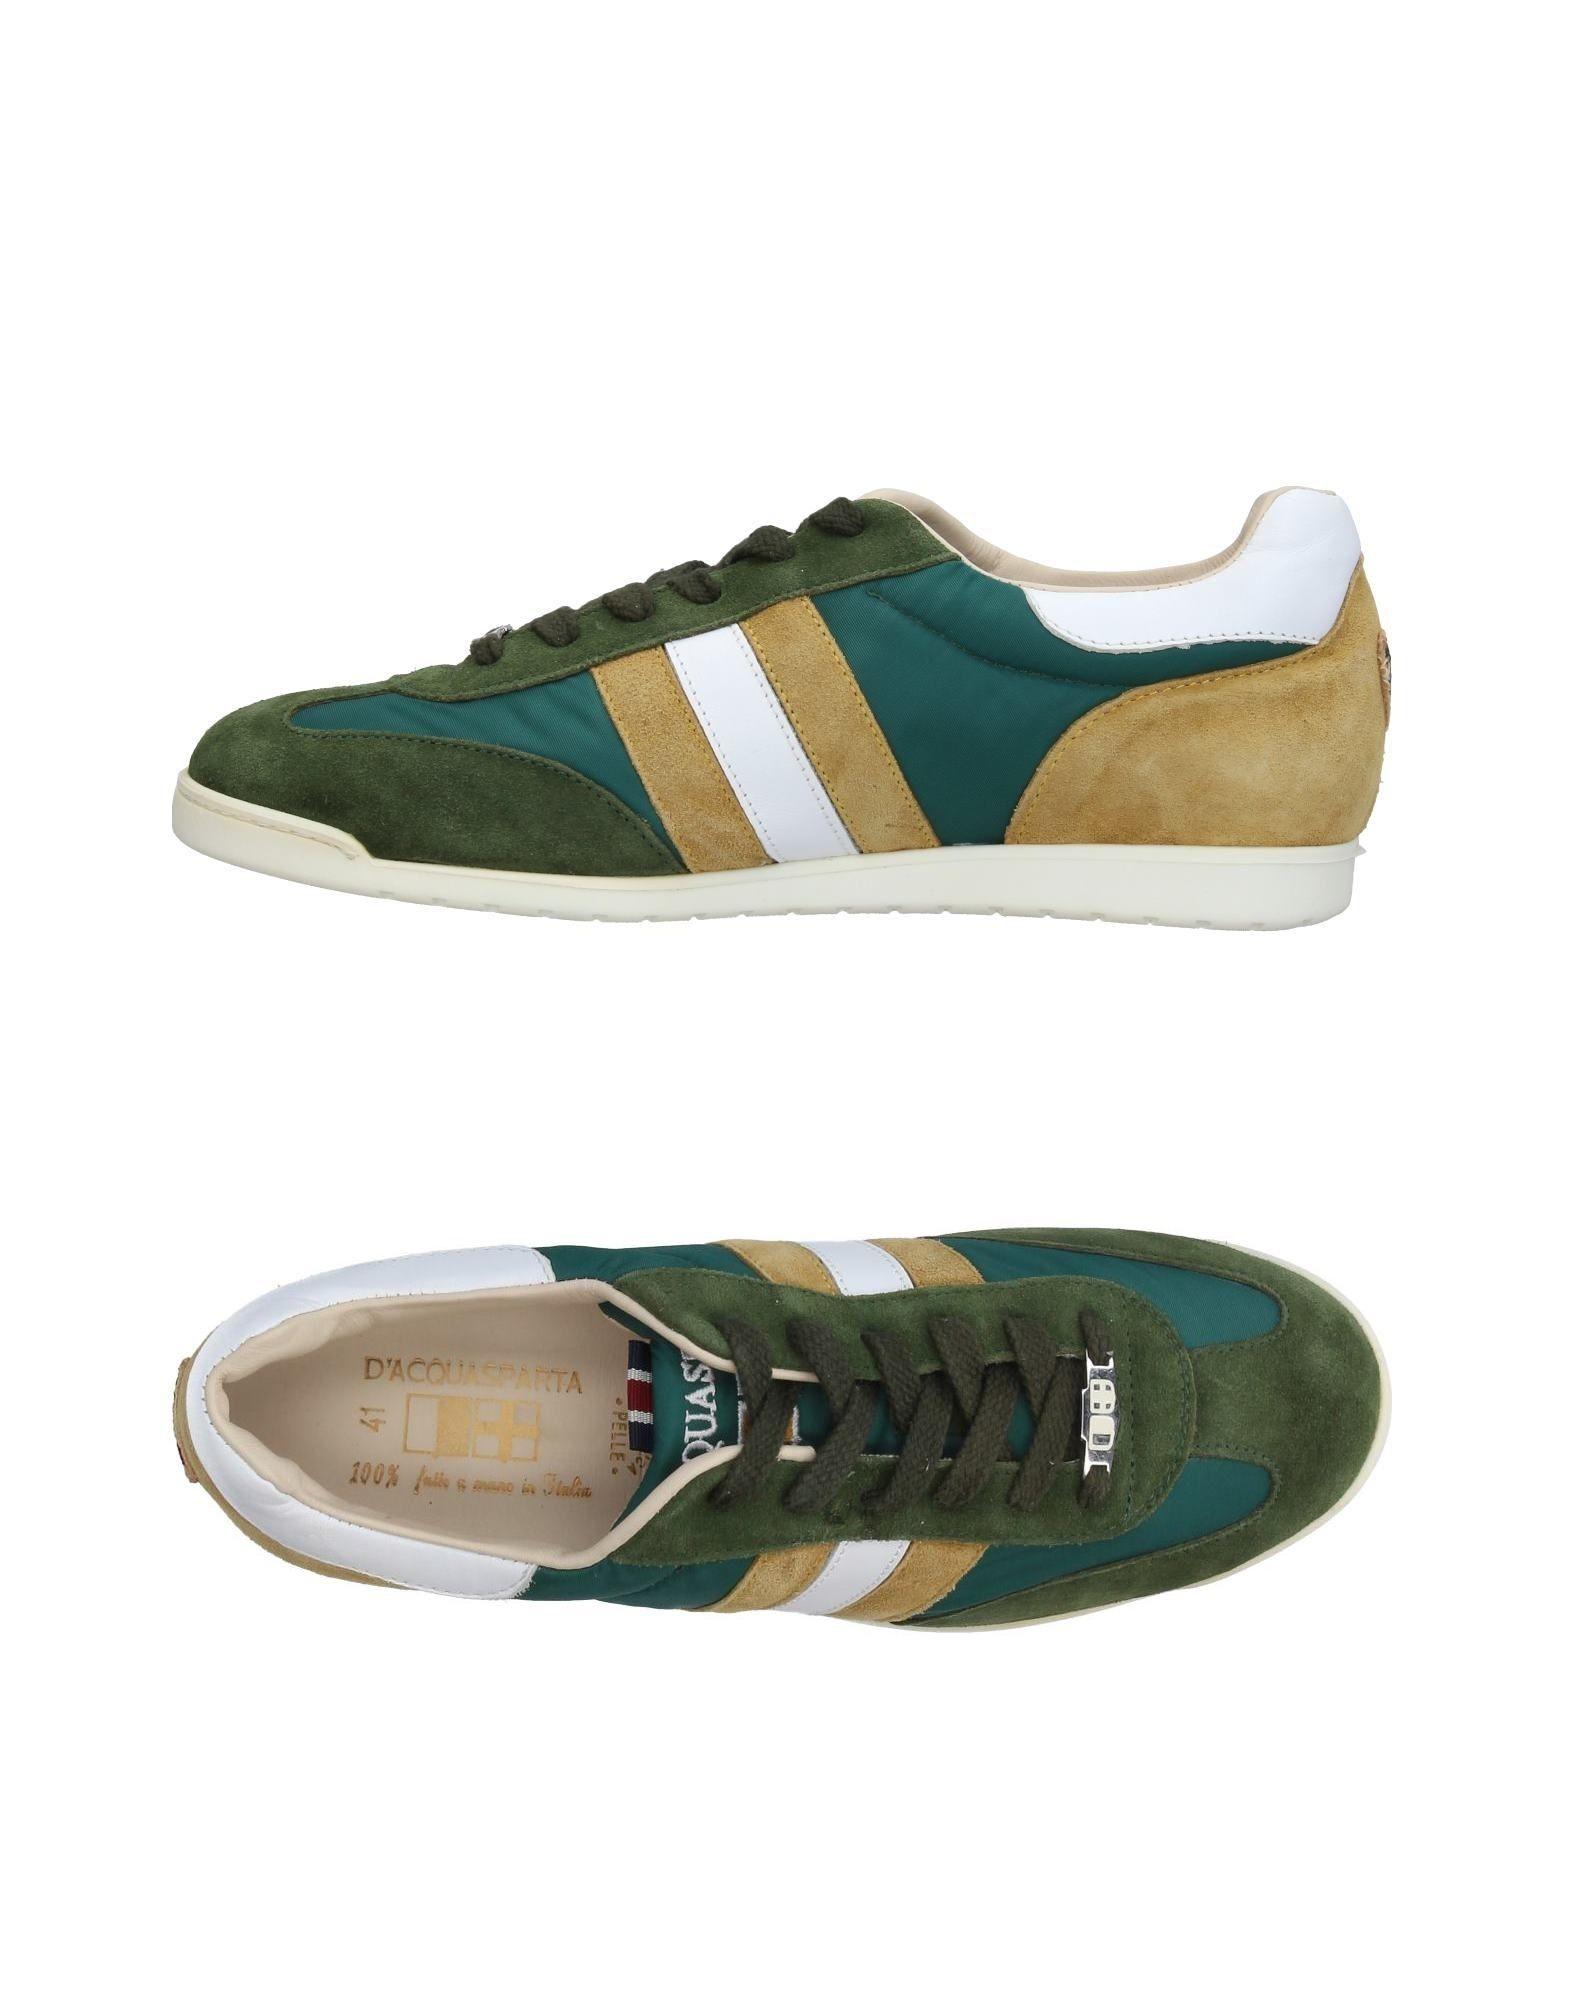 Rabatt echte 11390280MQ Schuhe D'Acquasparta Sneakers Herren  11390280MQ echte 038c75